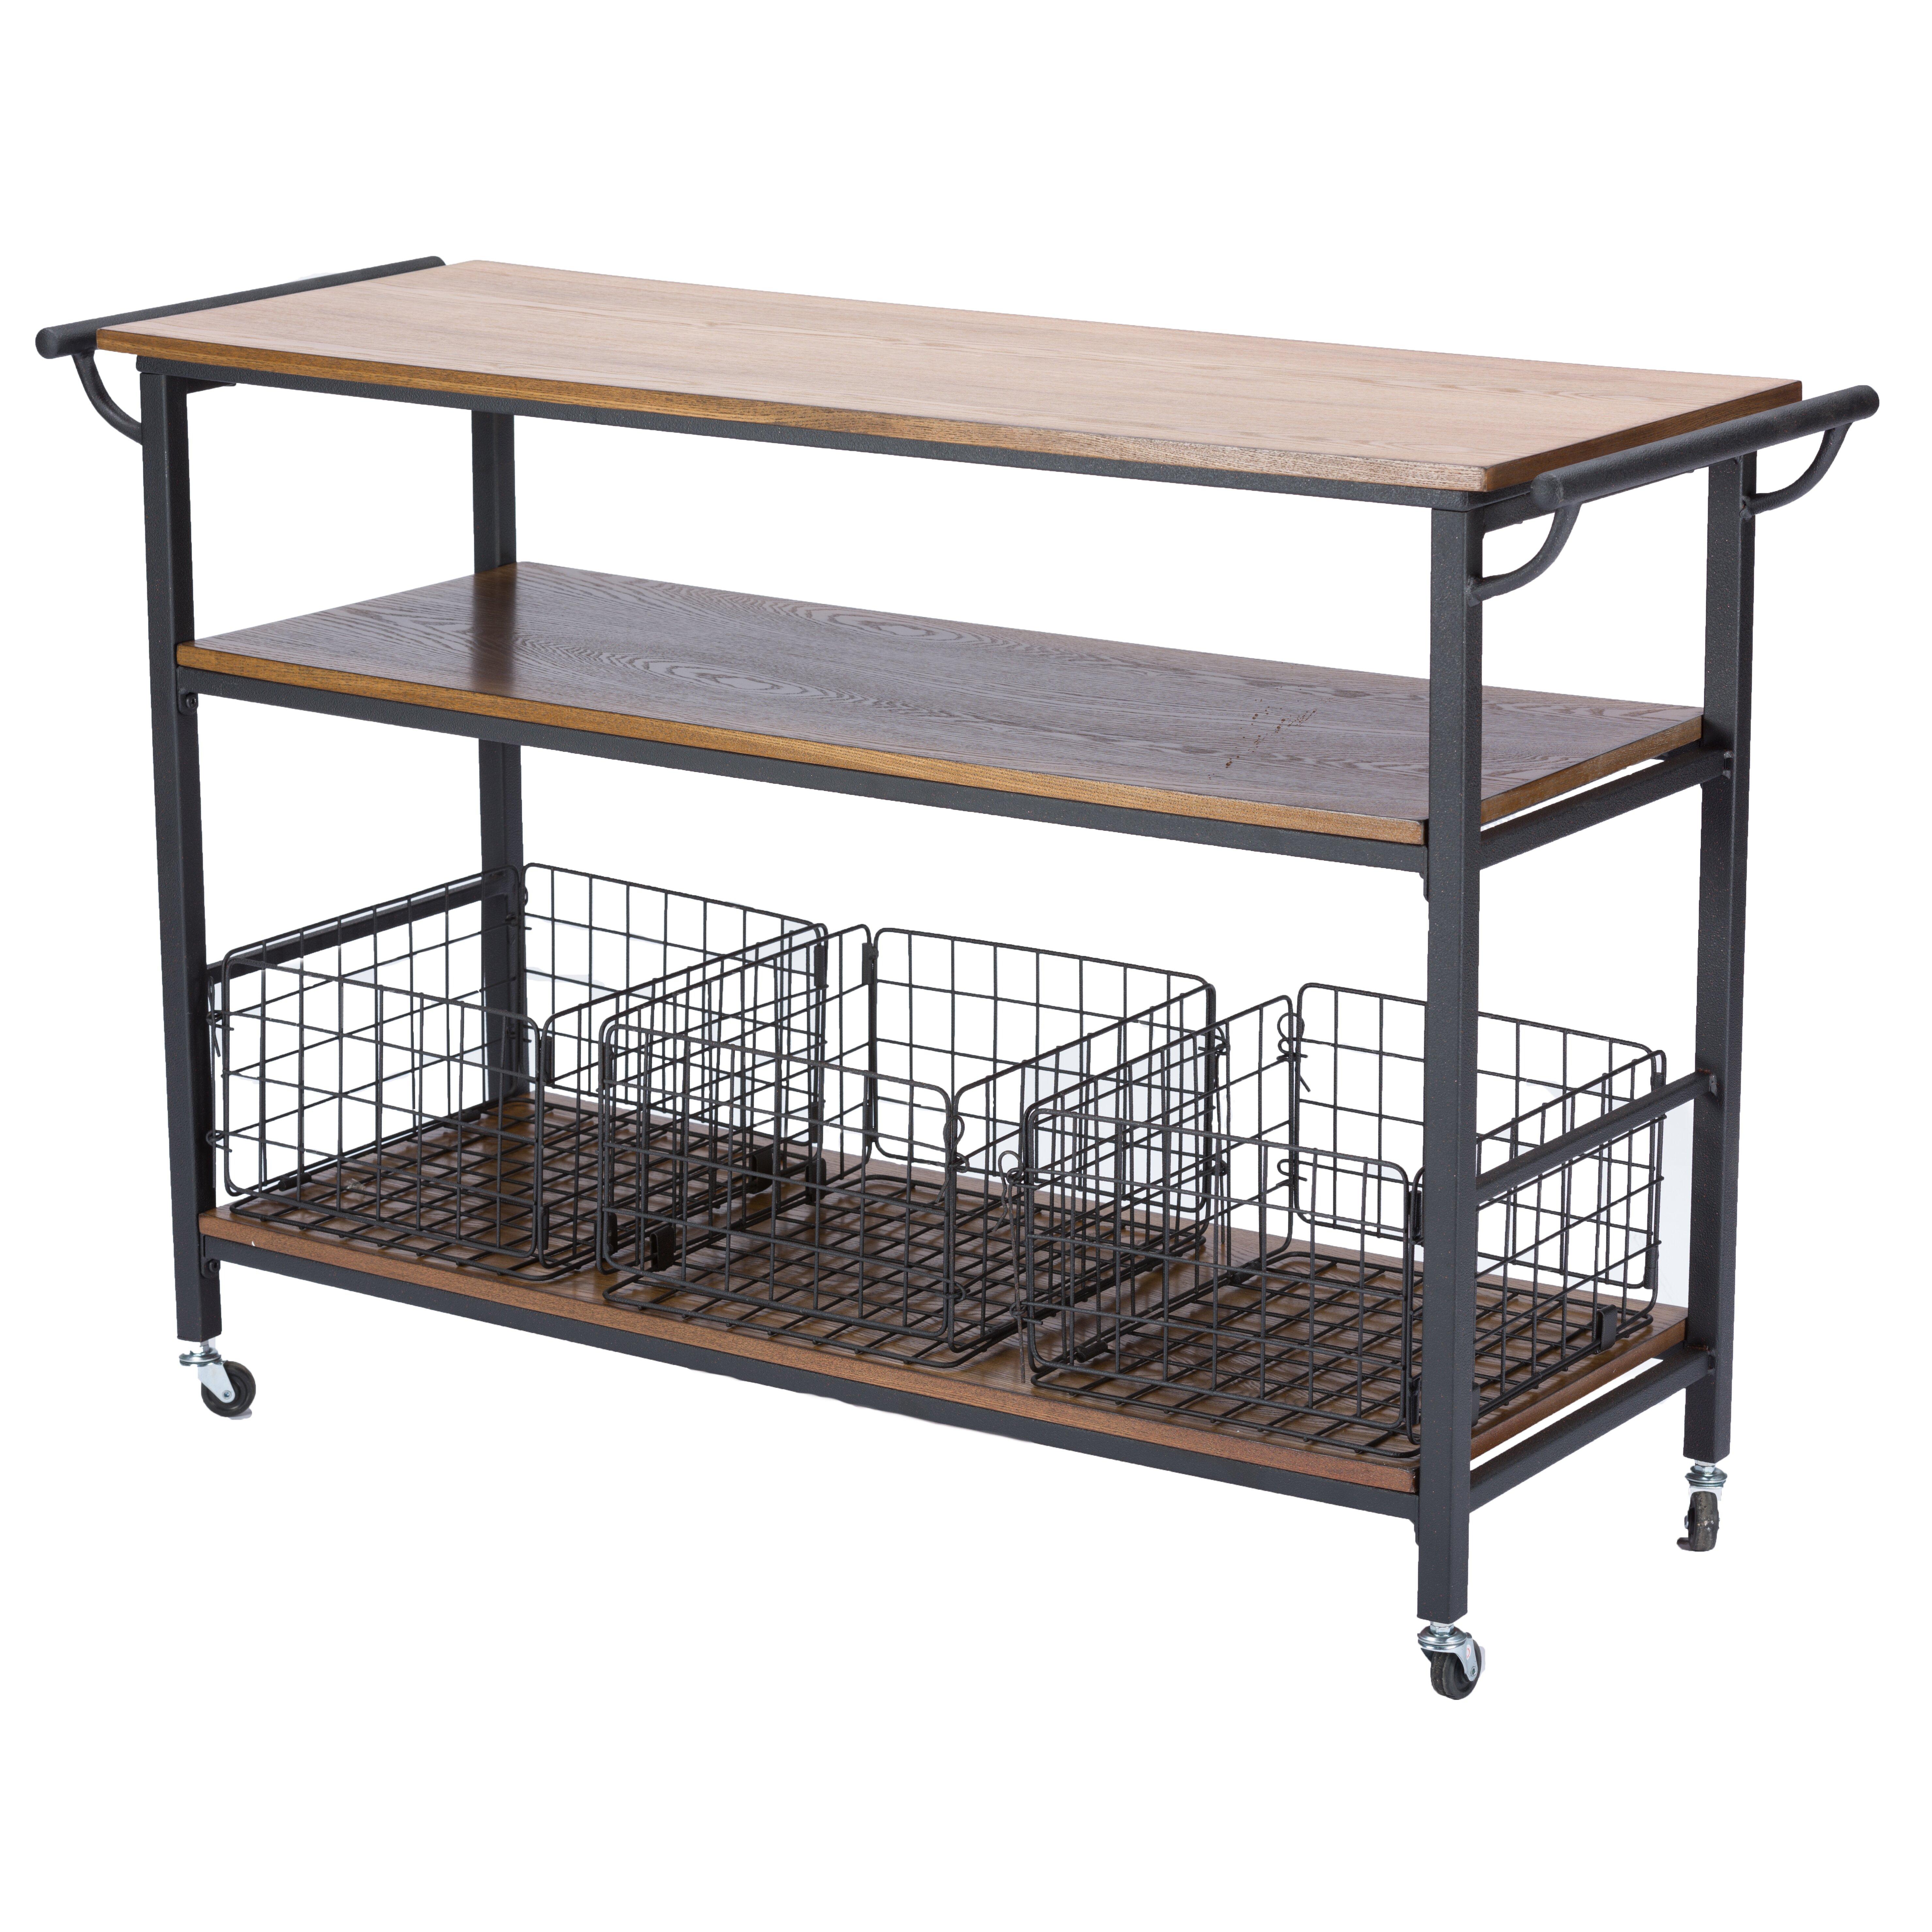 Wholesale Interiors Lancashire Kitchen Cart With Wooden Top Reviews Wayfair